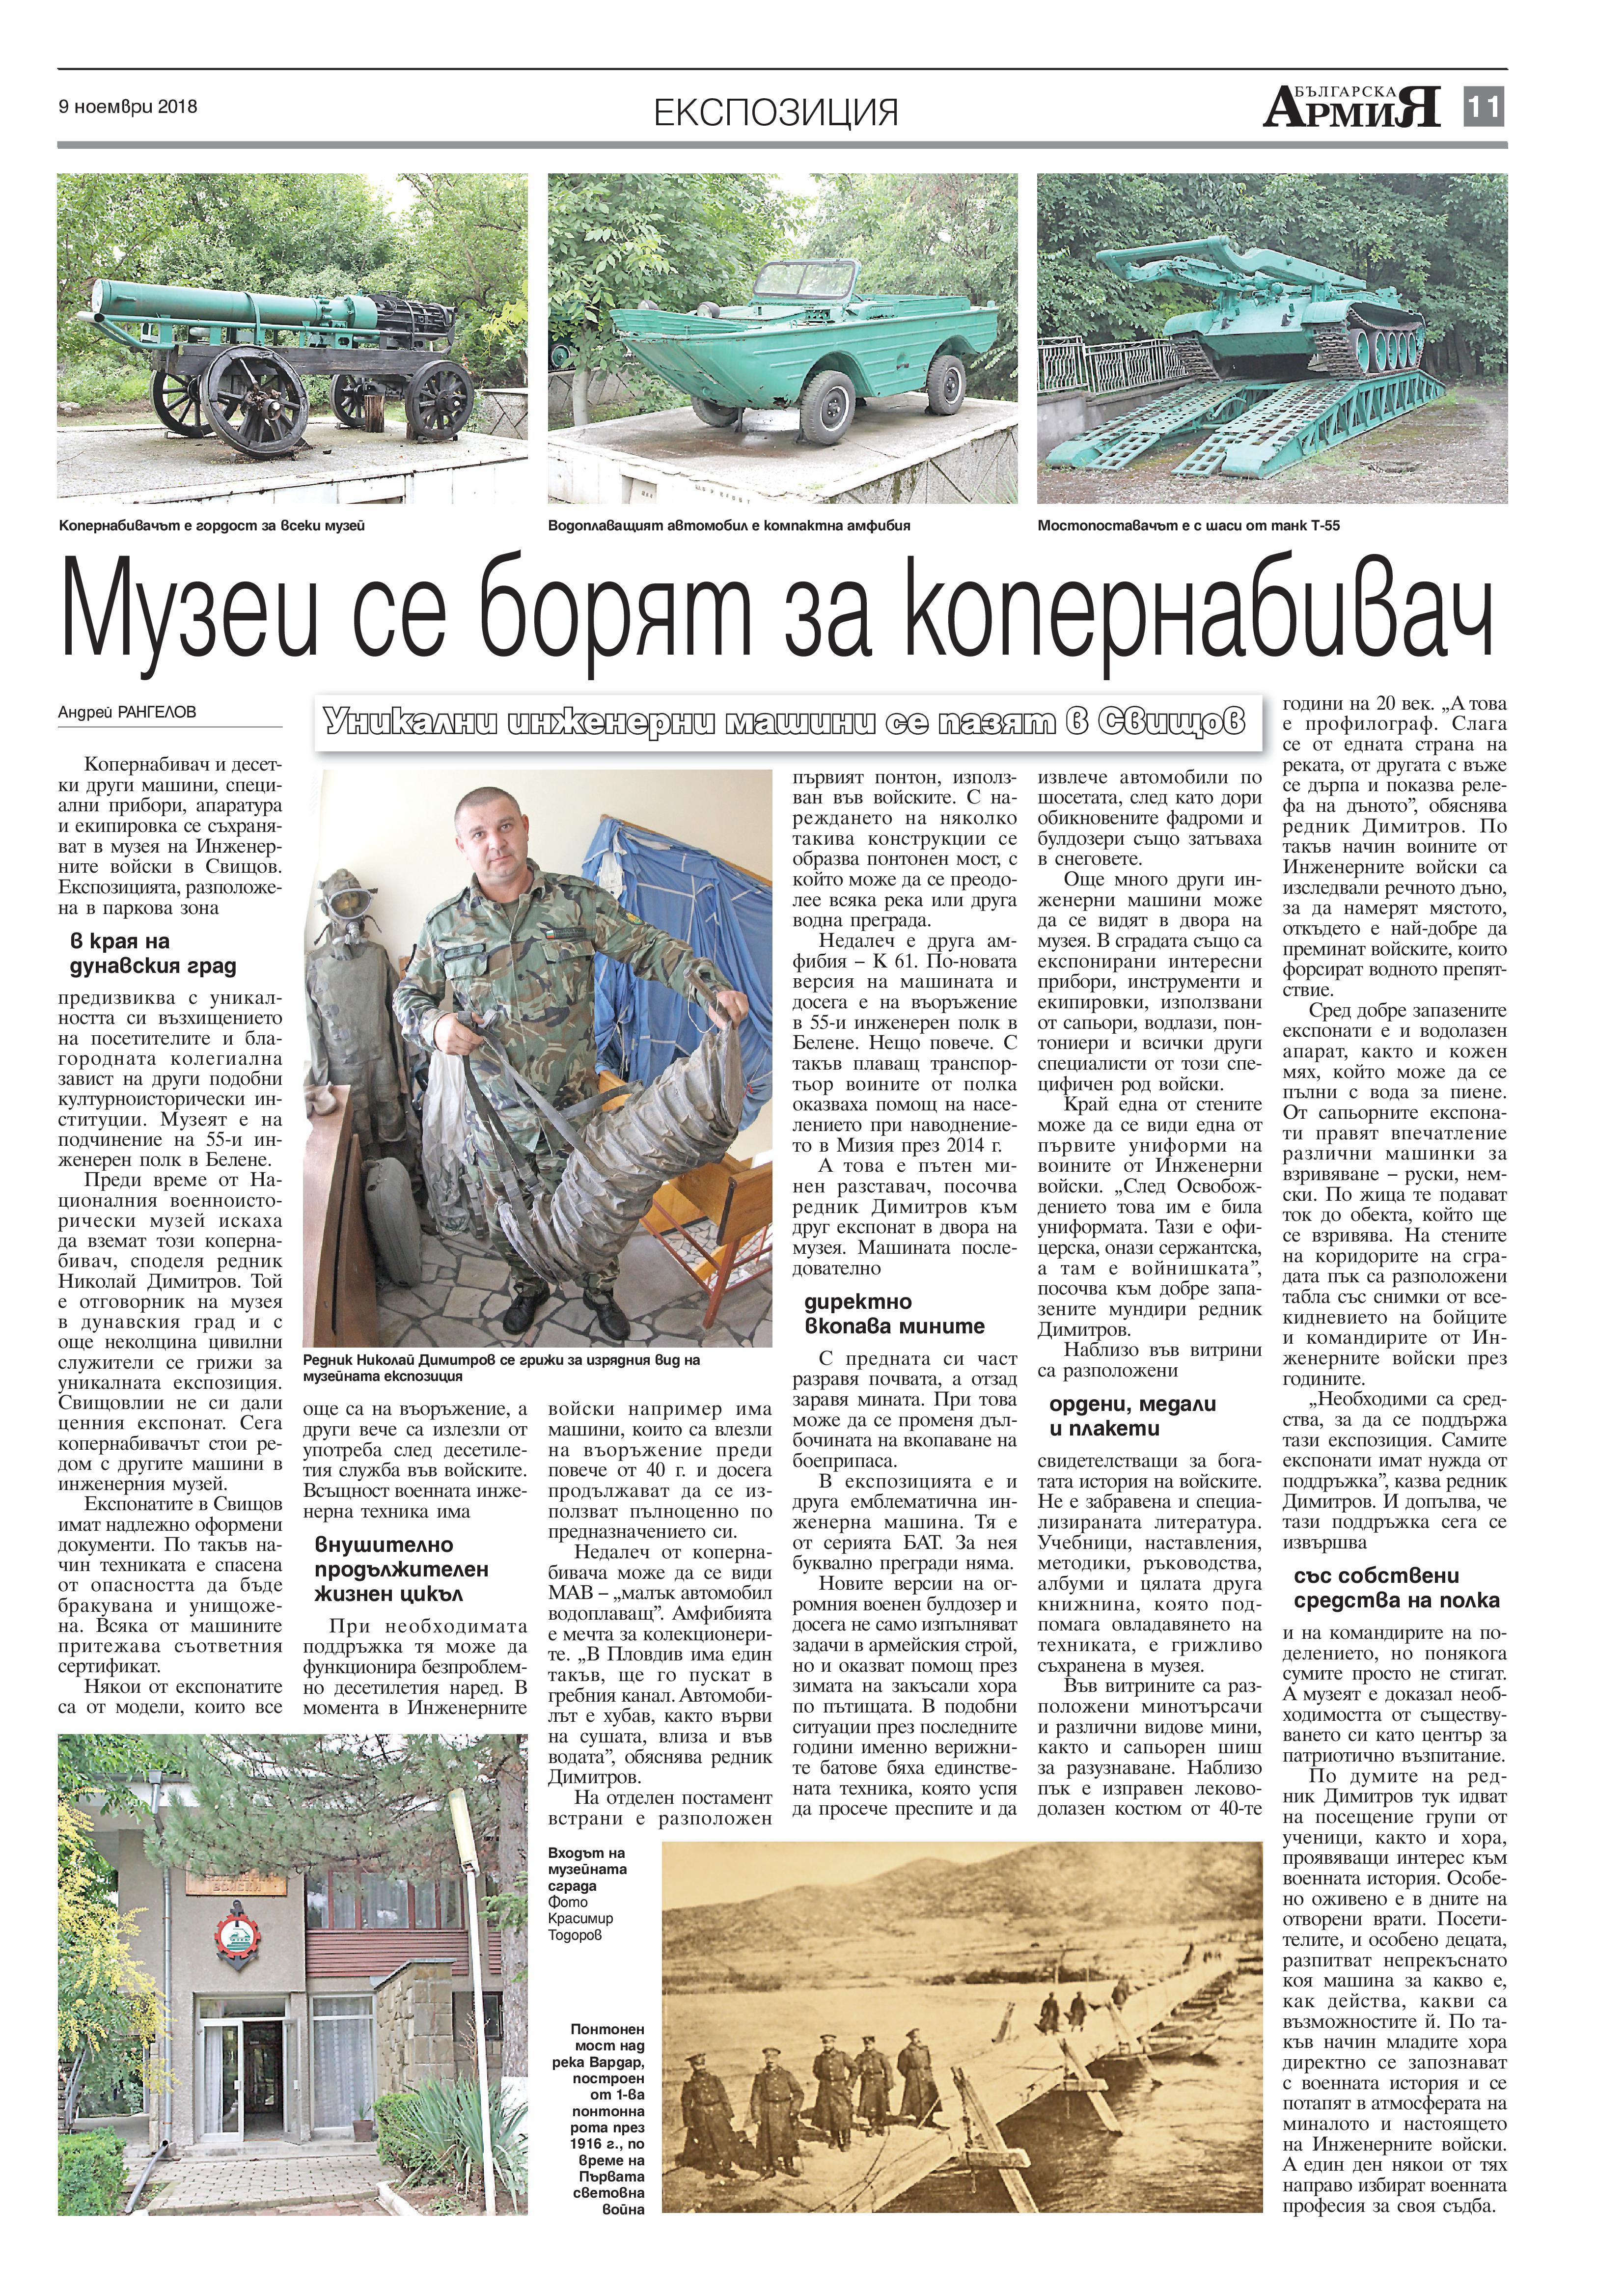 https://armymedia.bg/wp-content/uploads/2015/06/11-25.jpg